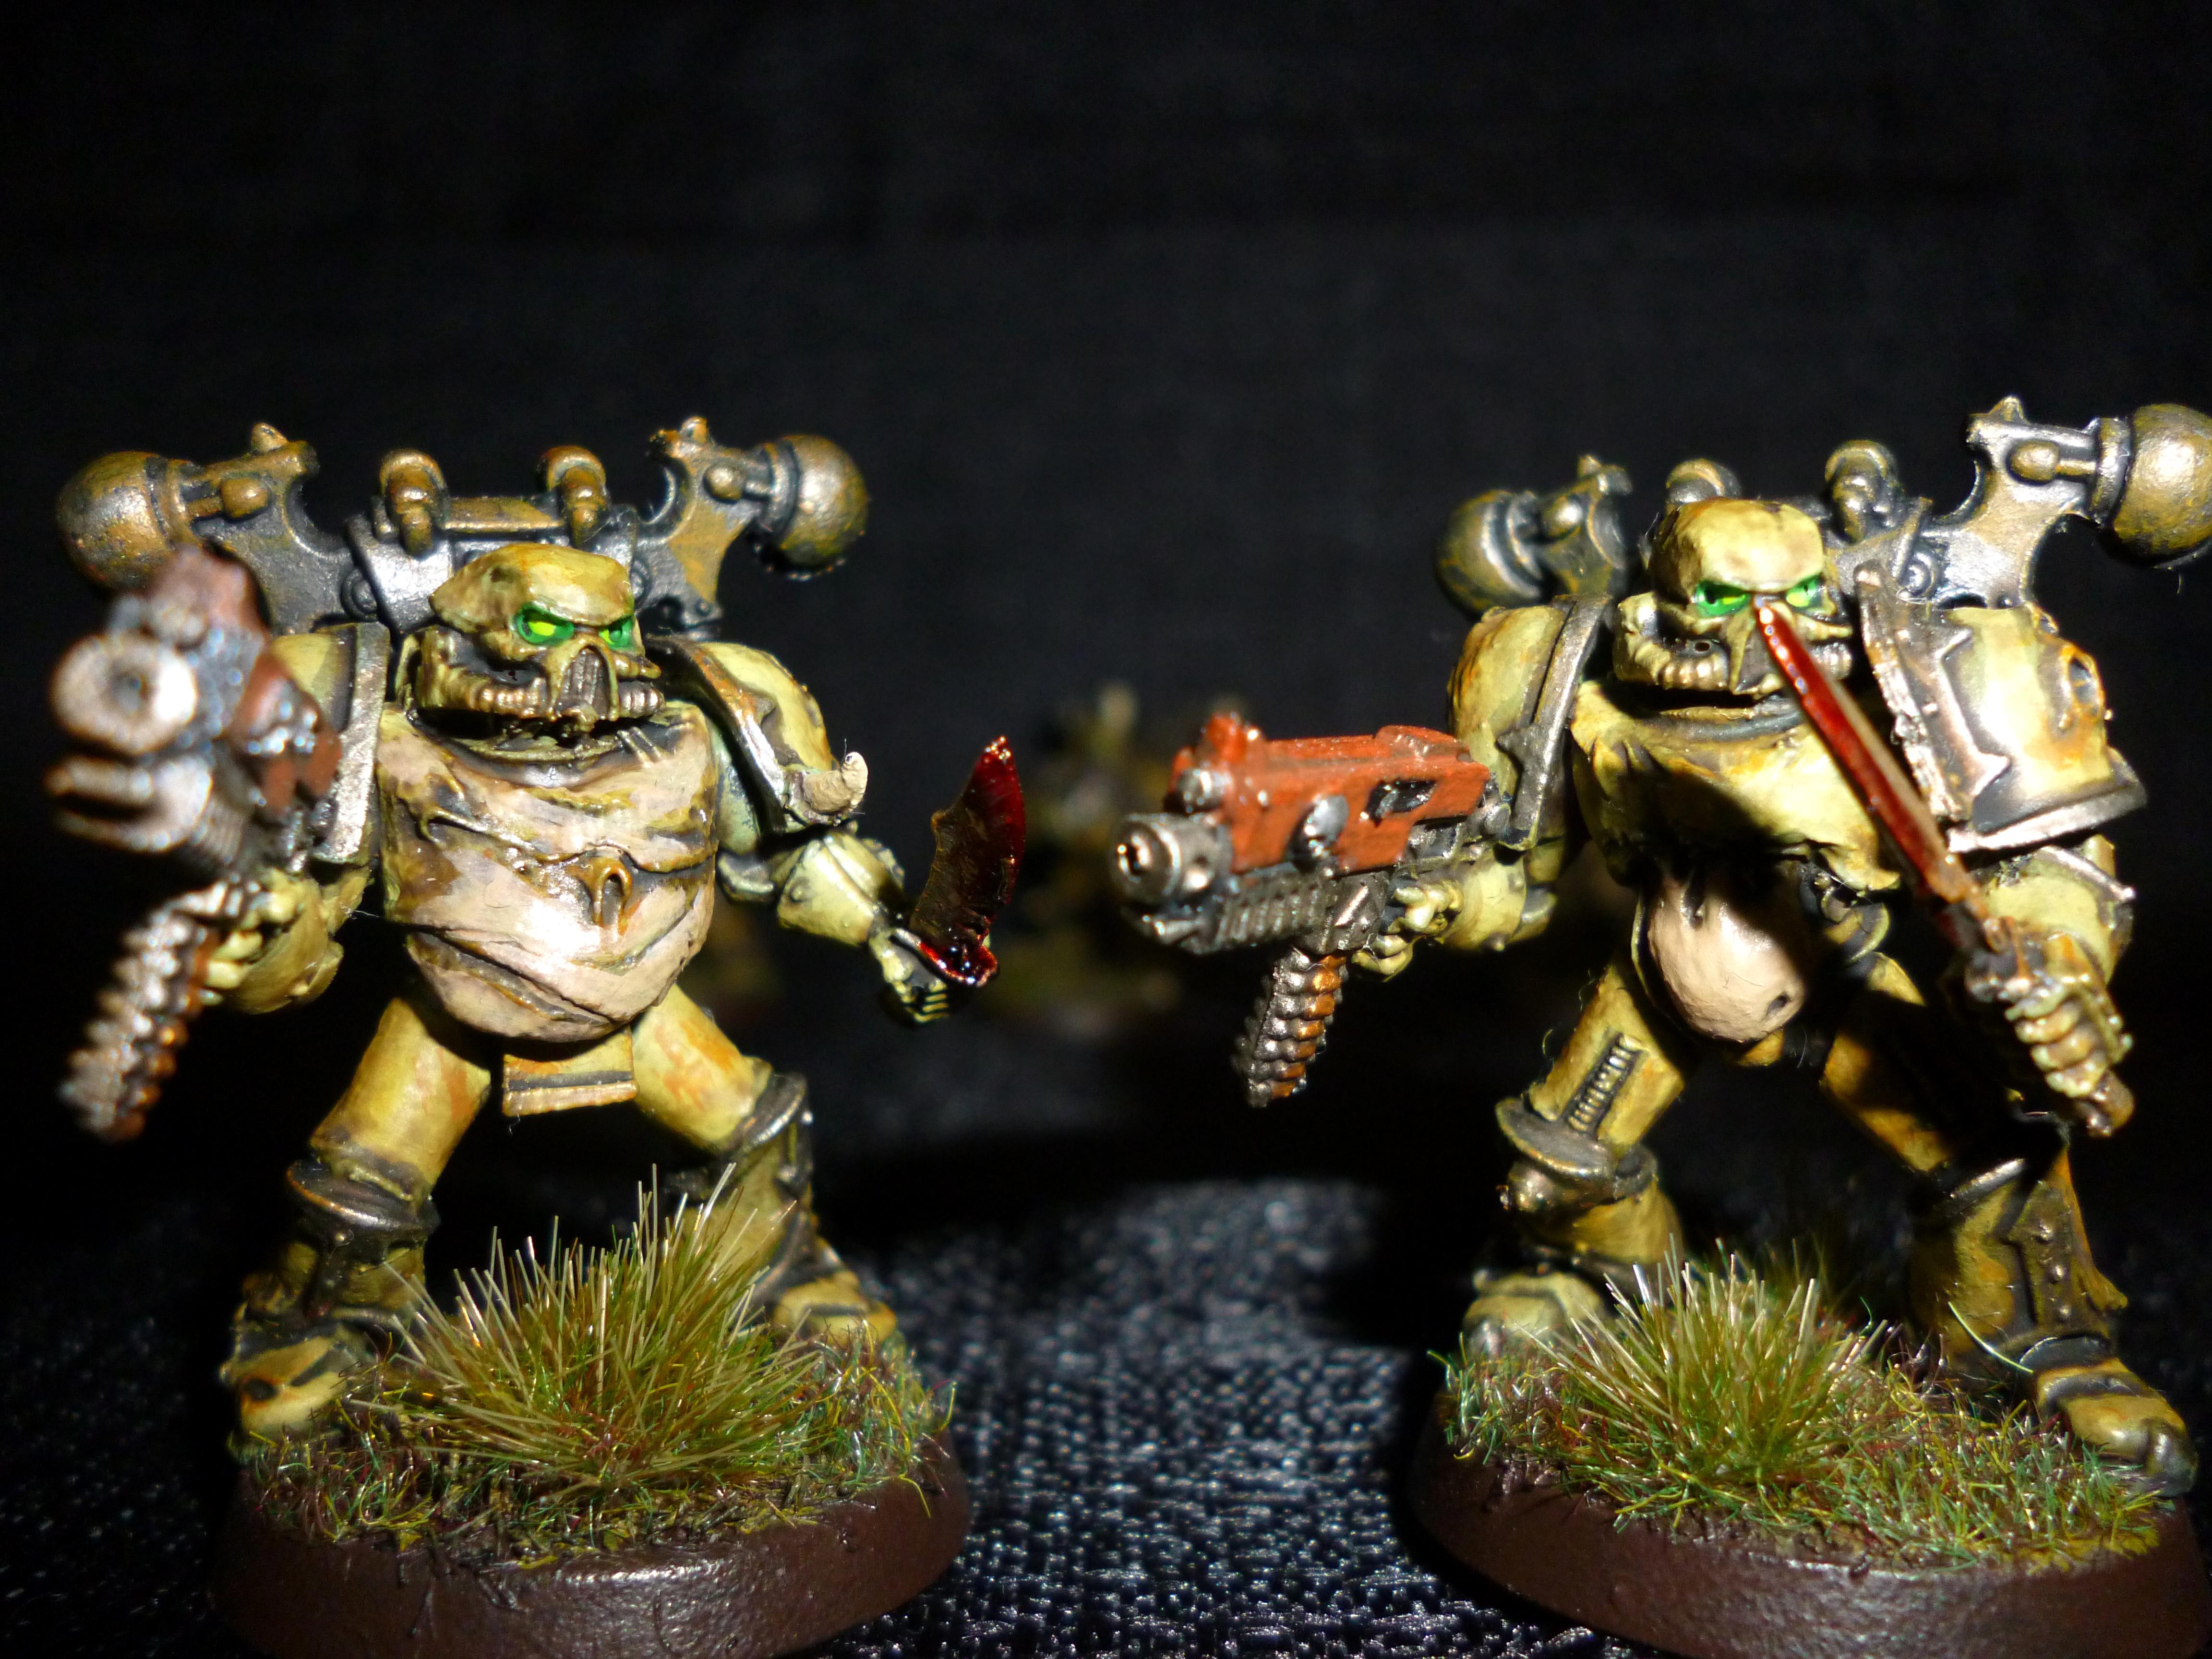 Chaos, Chaos Space Marines, Death Guard, Nurgle, Plague, Plague Marines, Rot, Warhammer 40,000